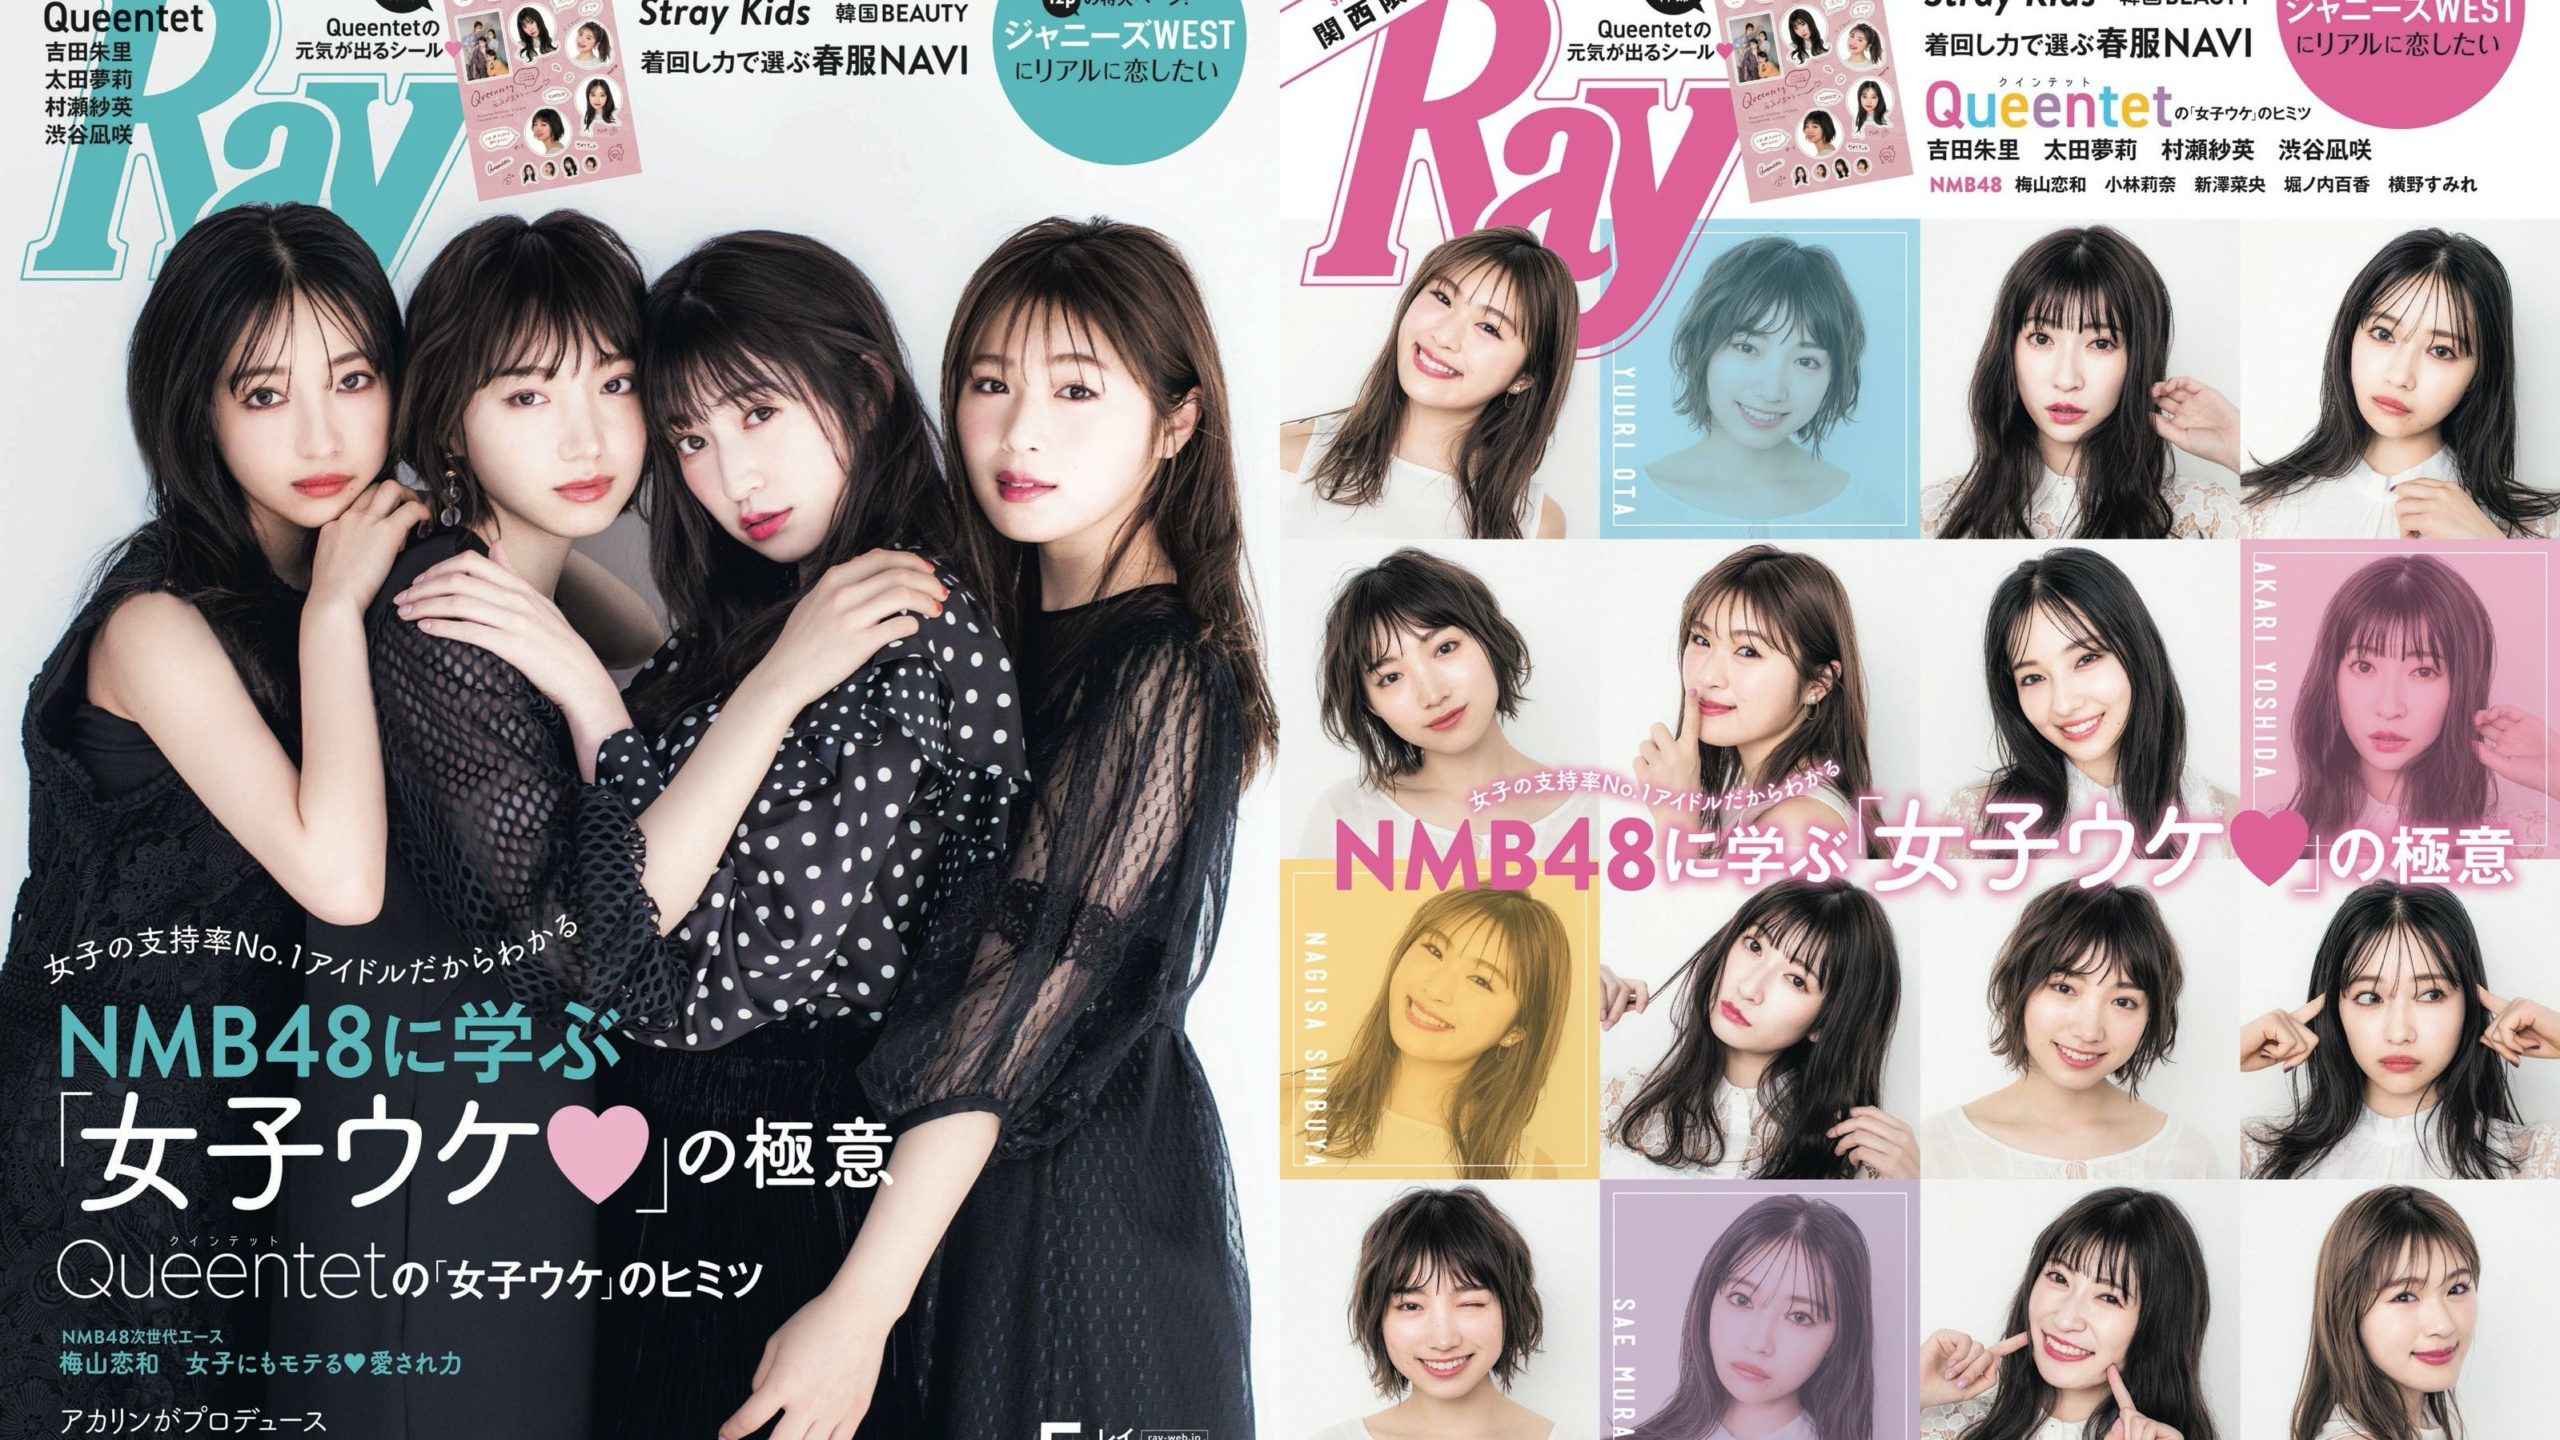 【NMB48】3/23発売Ray5月号のQueentet登場が正式に発表